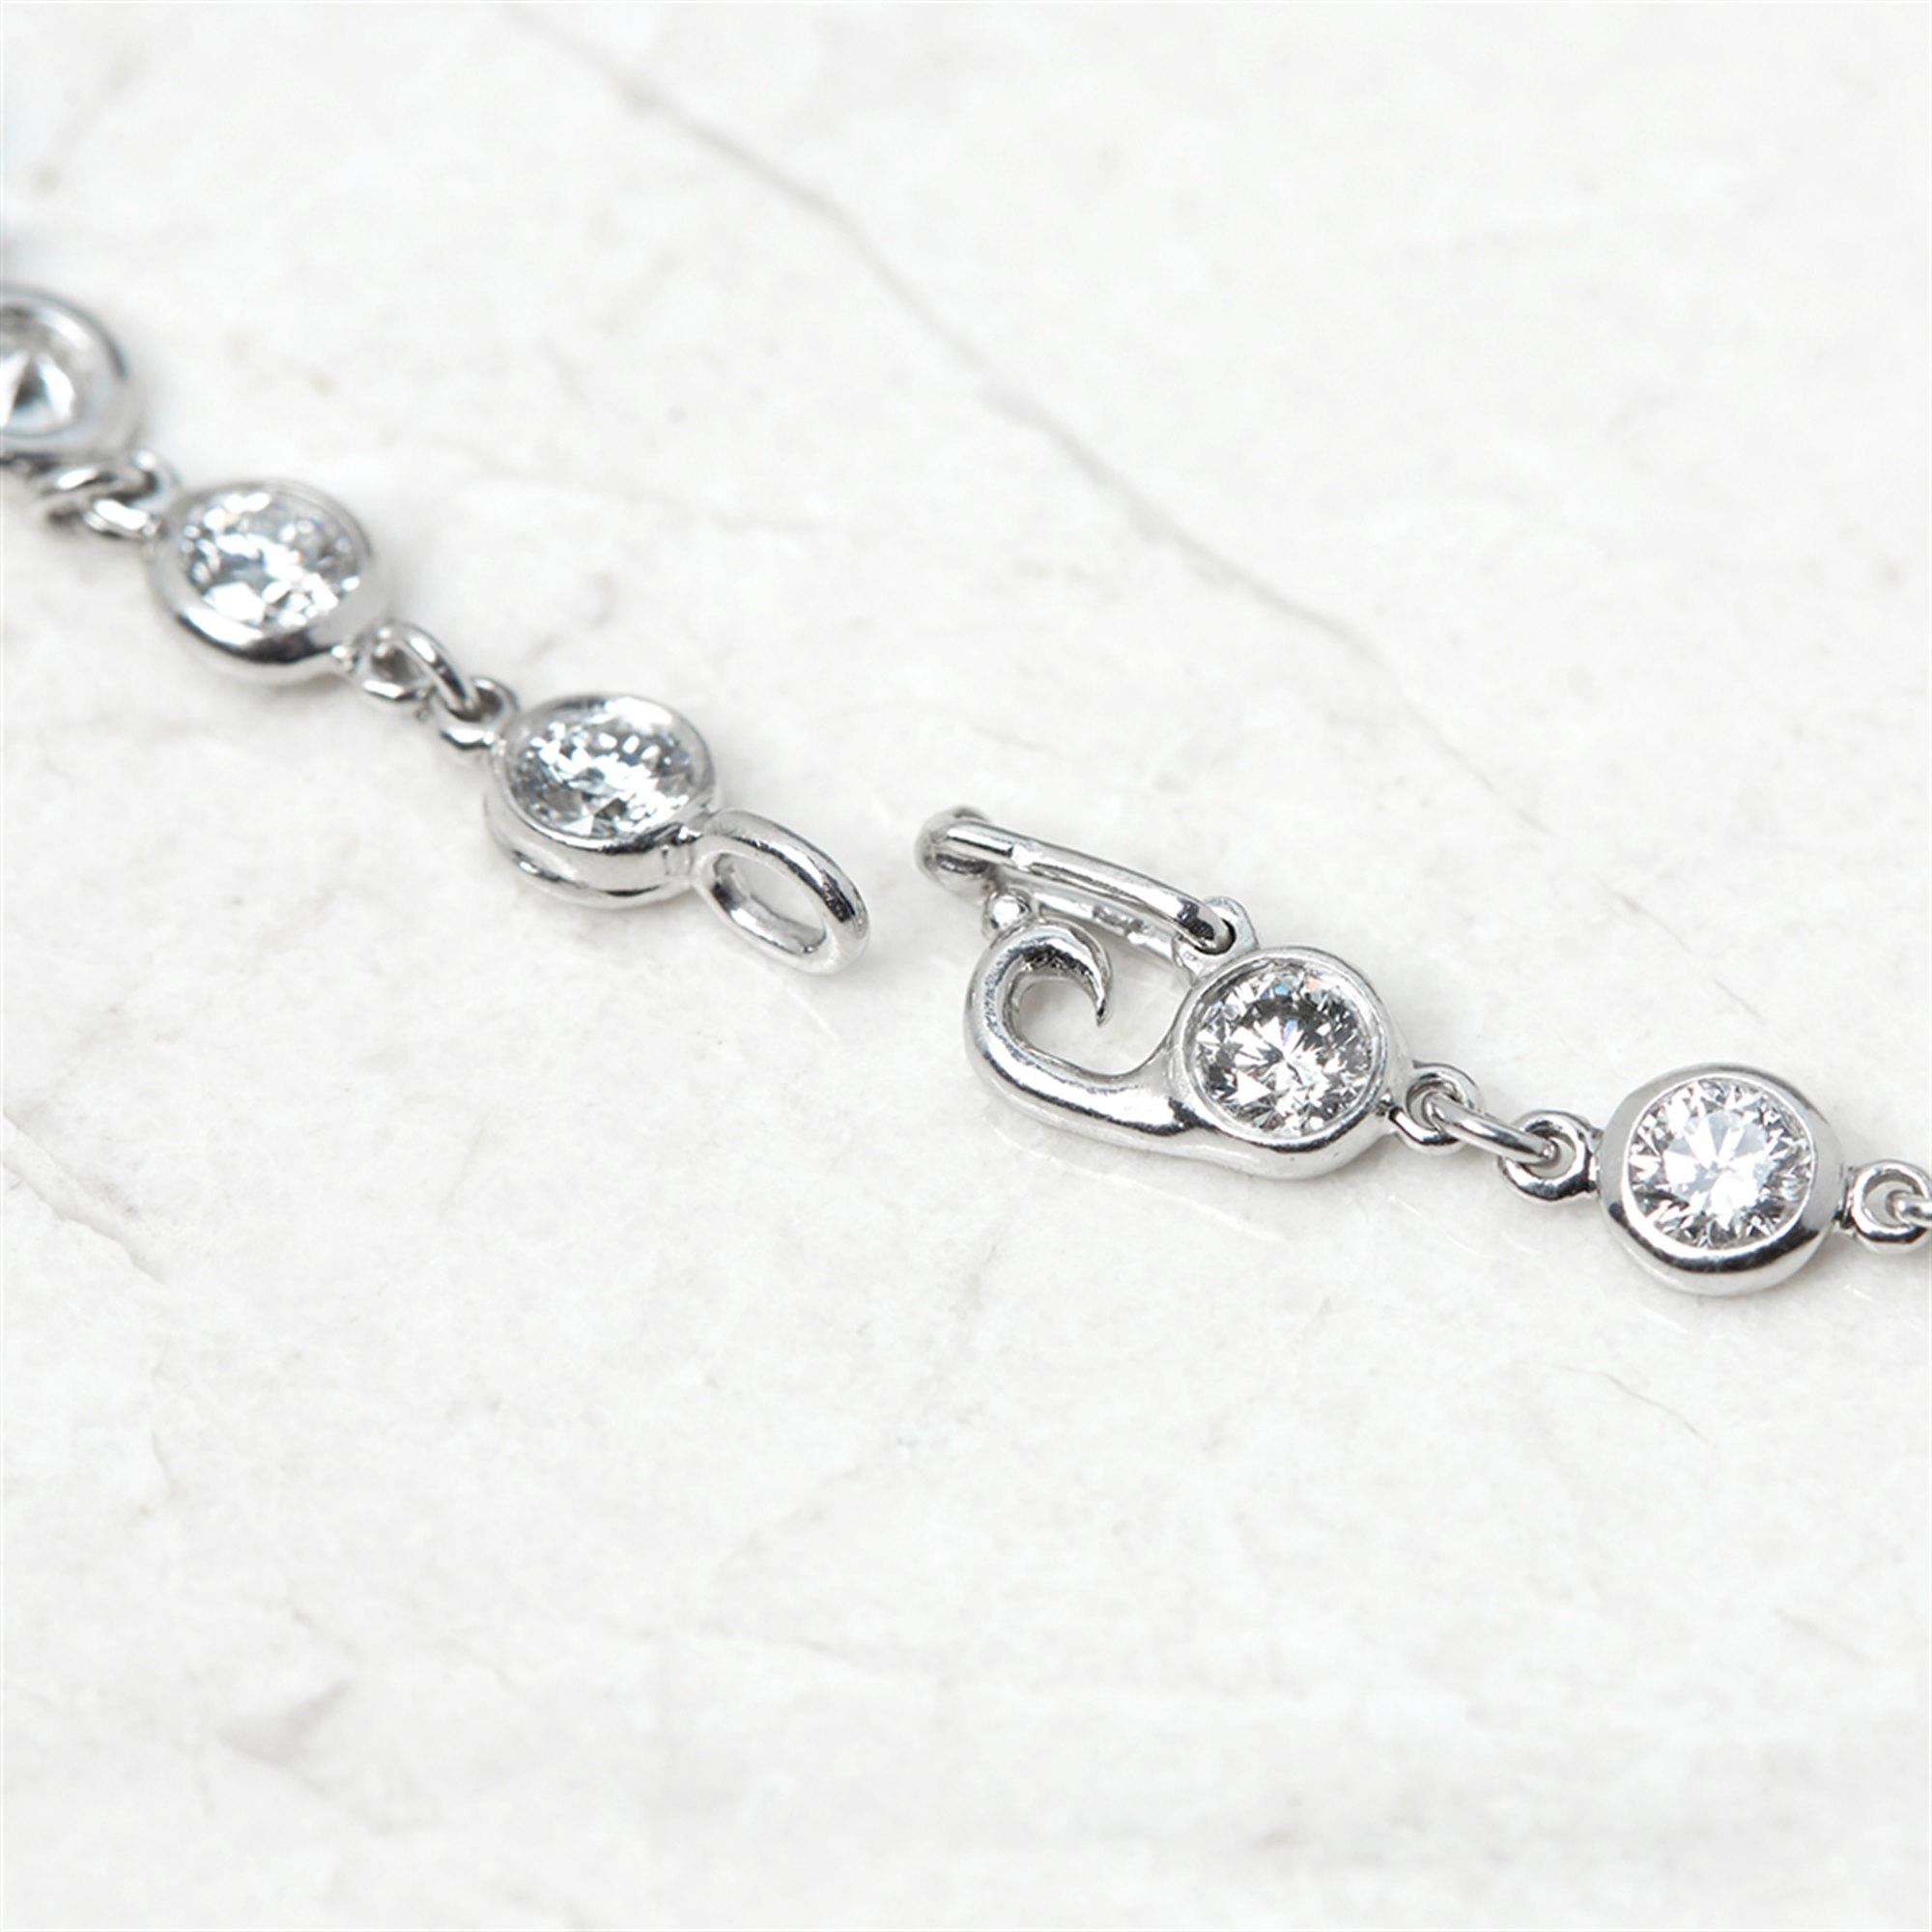 Tiffany & Co. Platinum Diamonds By The Yard Bracelet